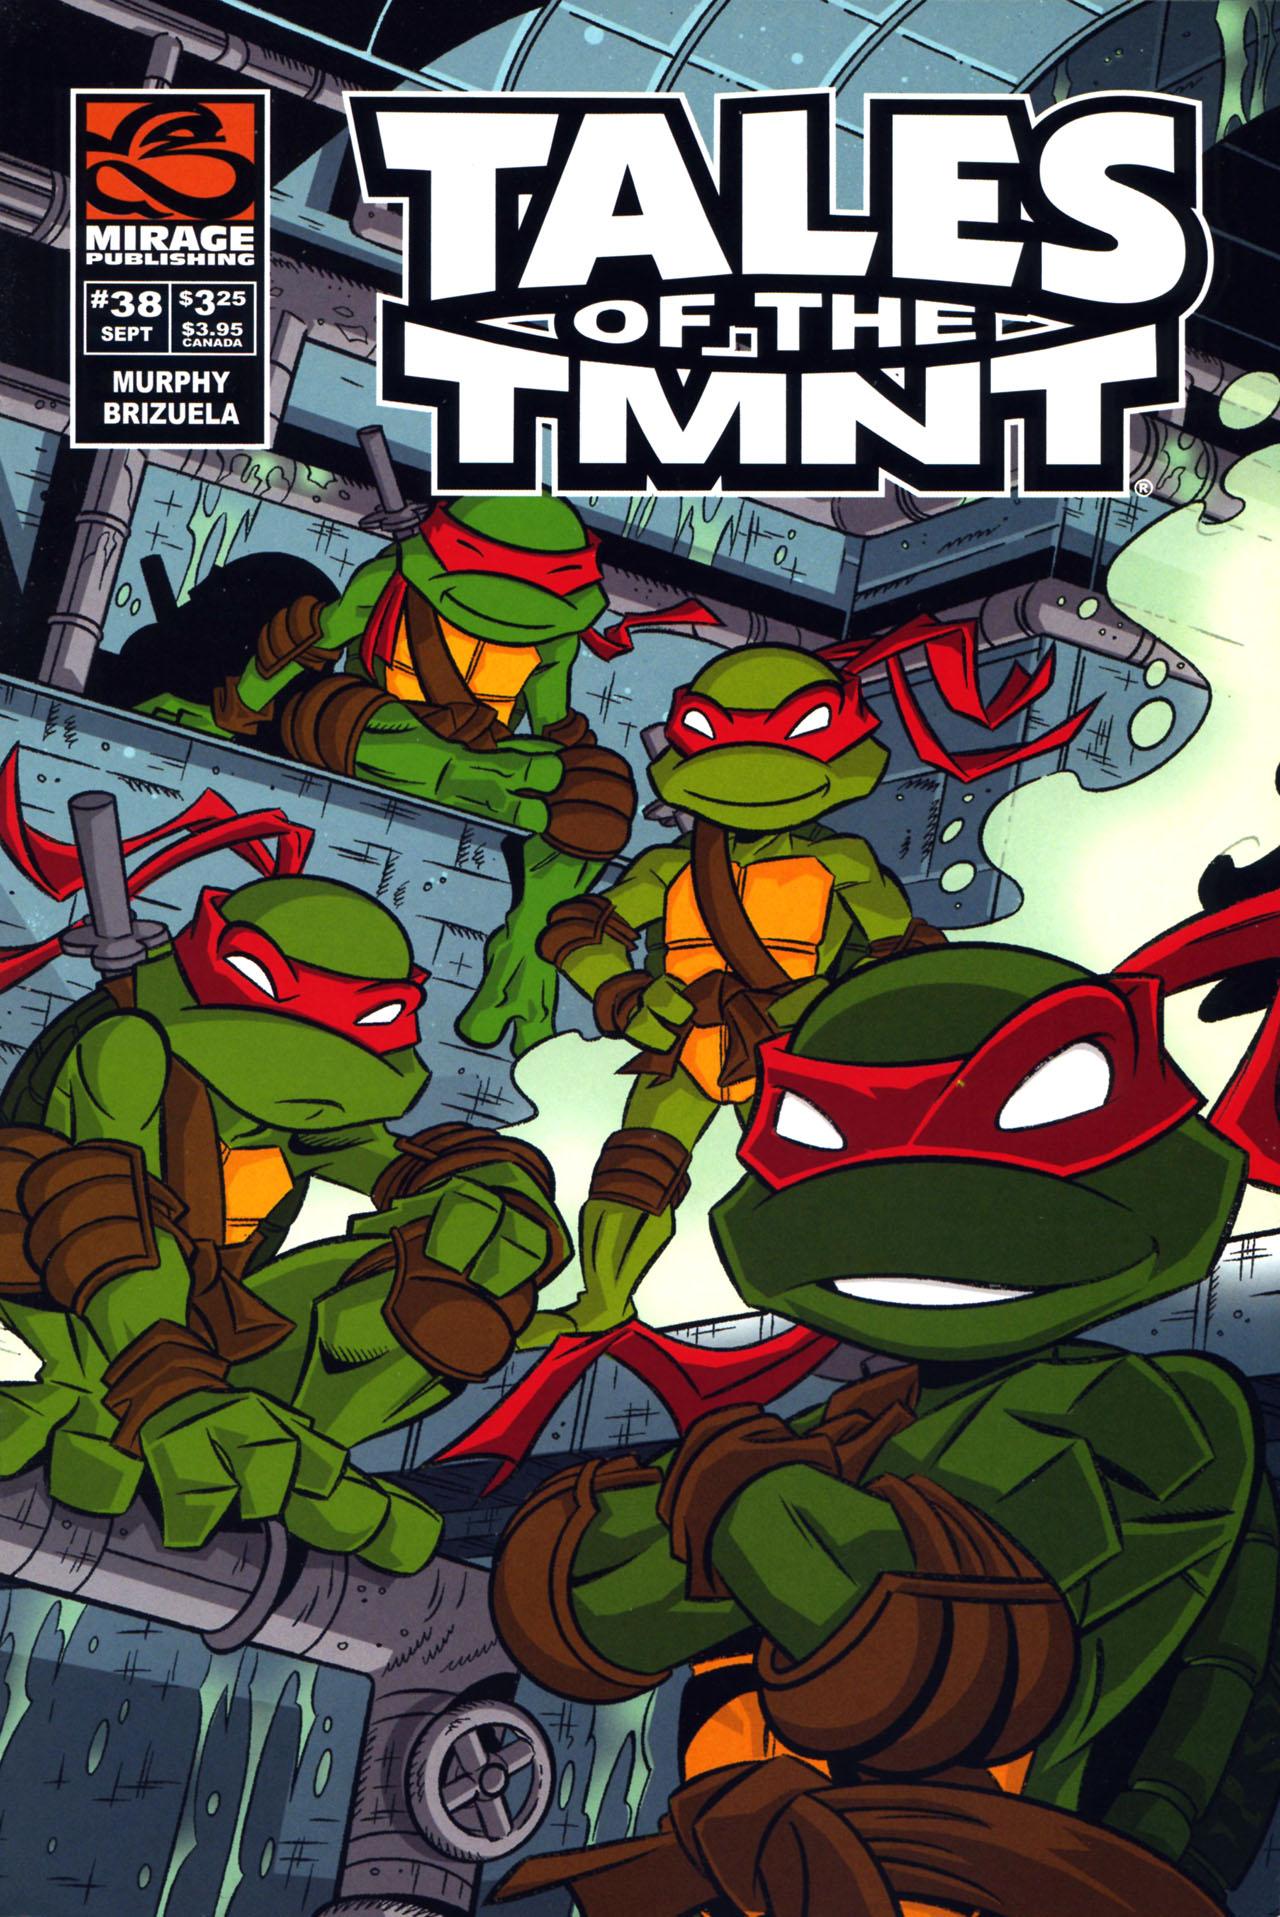 Tales of The TMNT Vol.2 #38.jpg